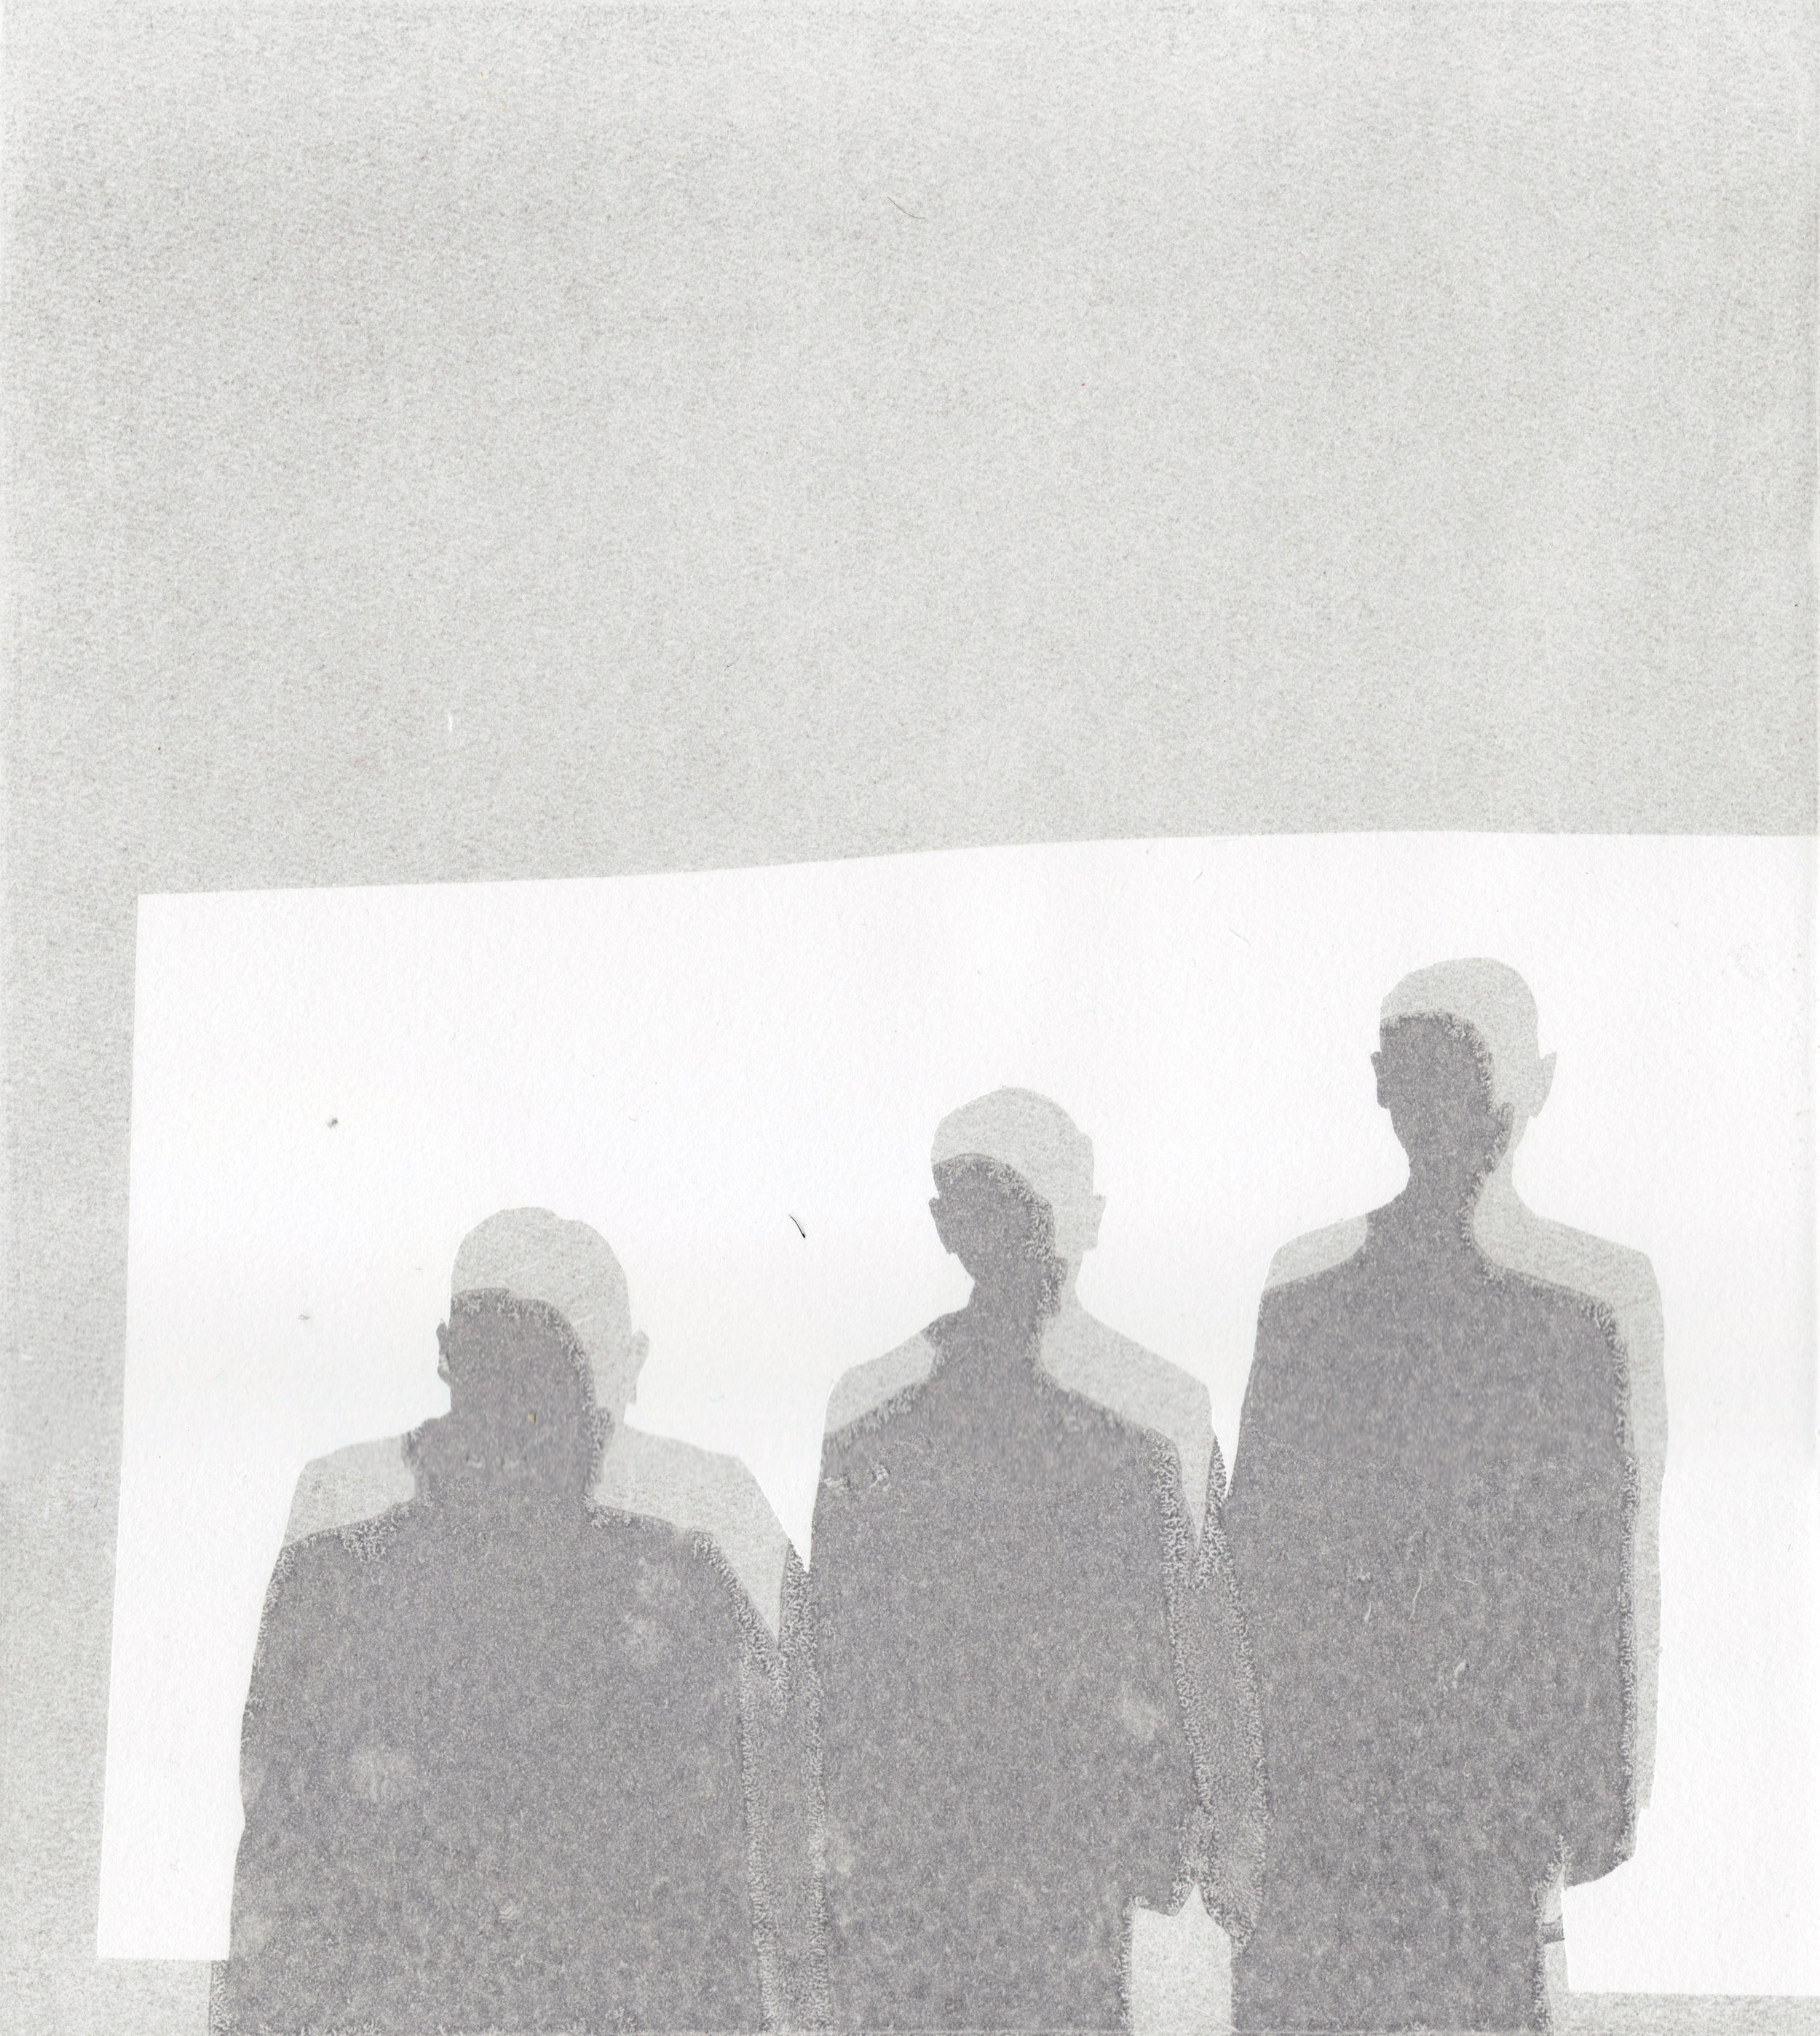 Silhouettes III